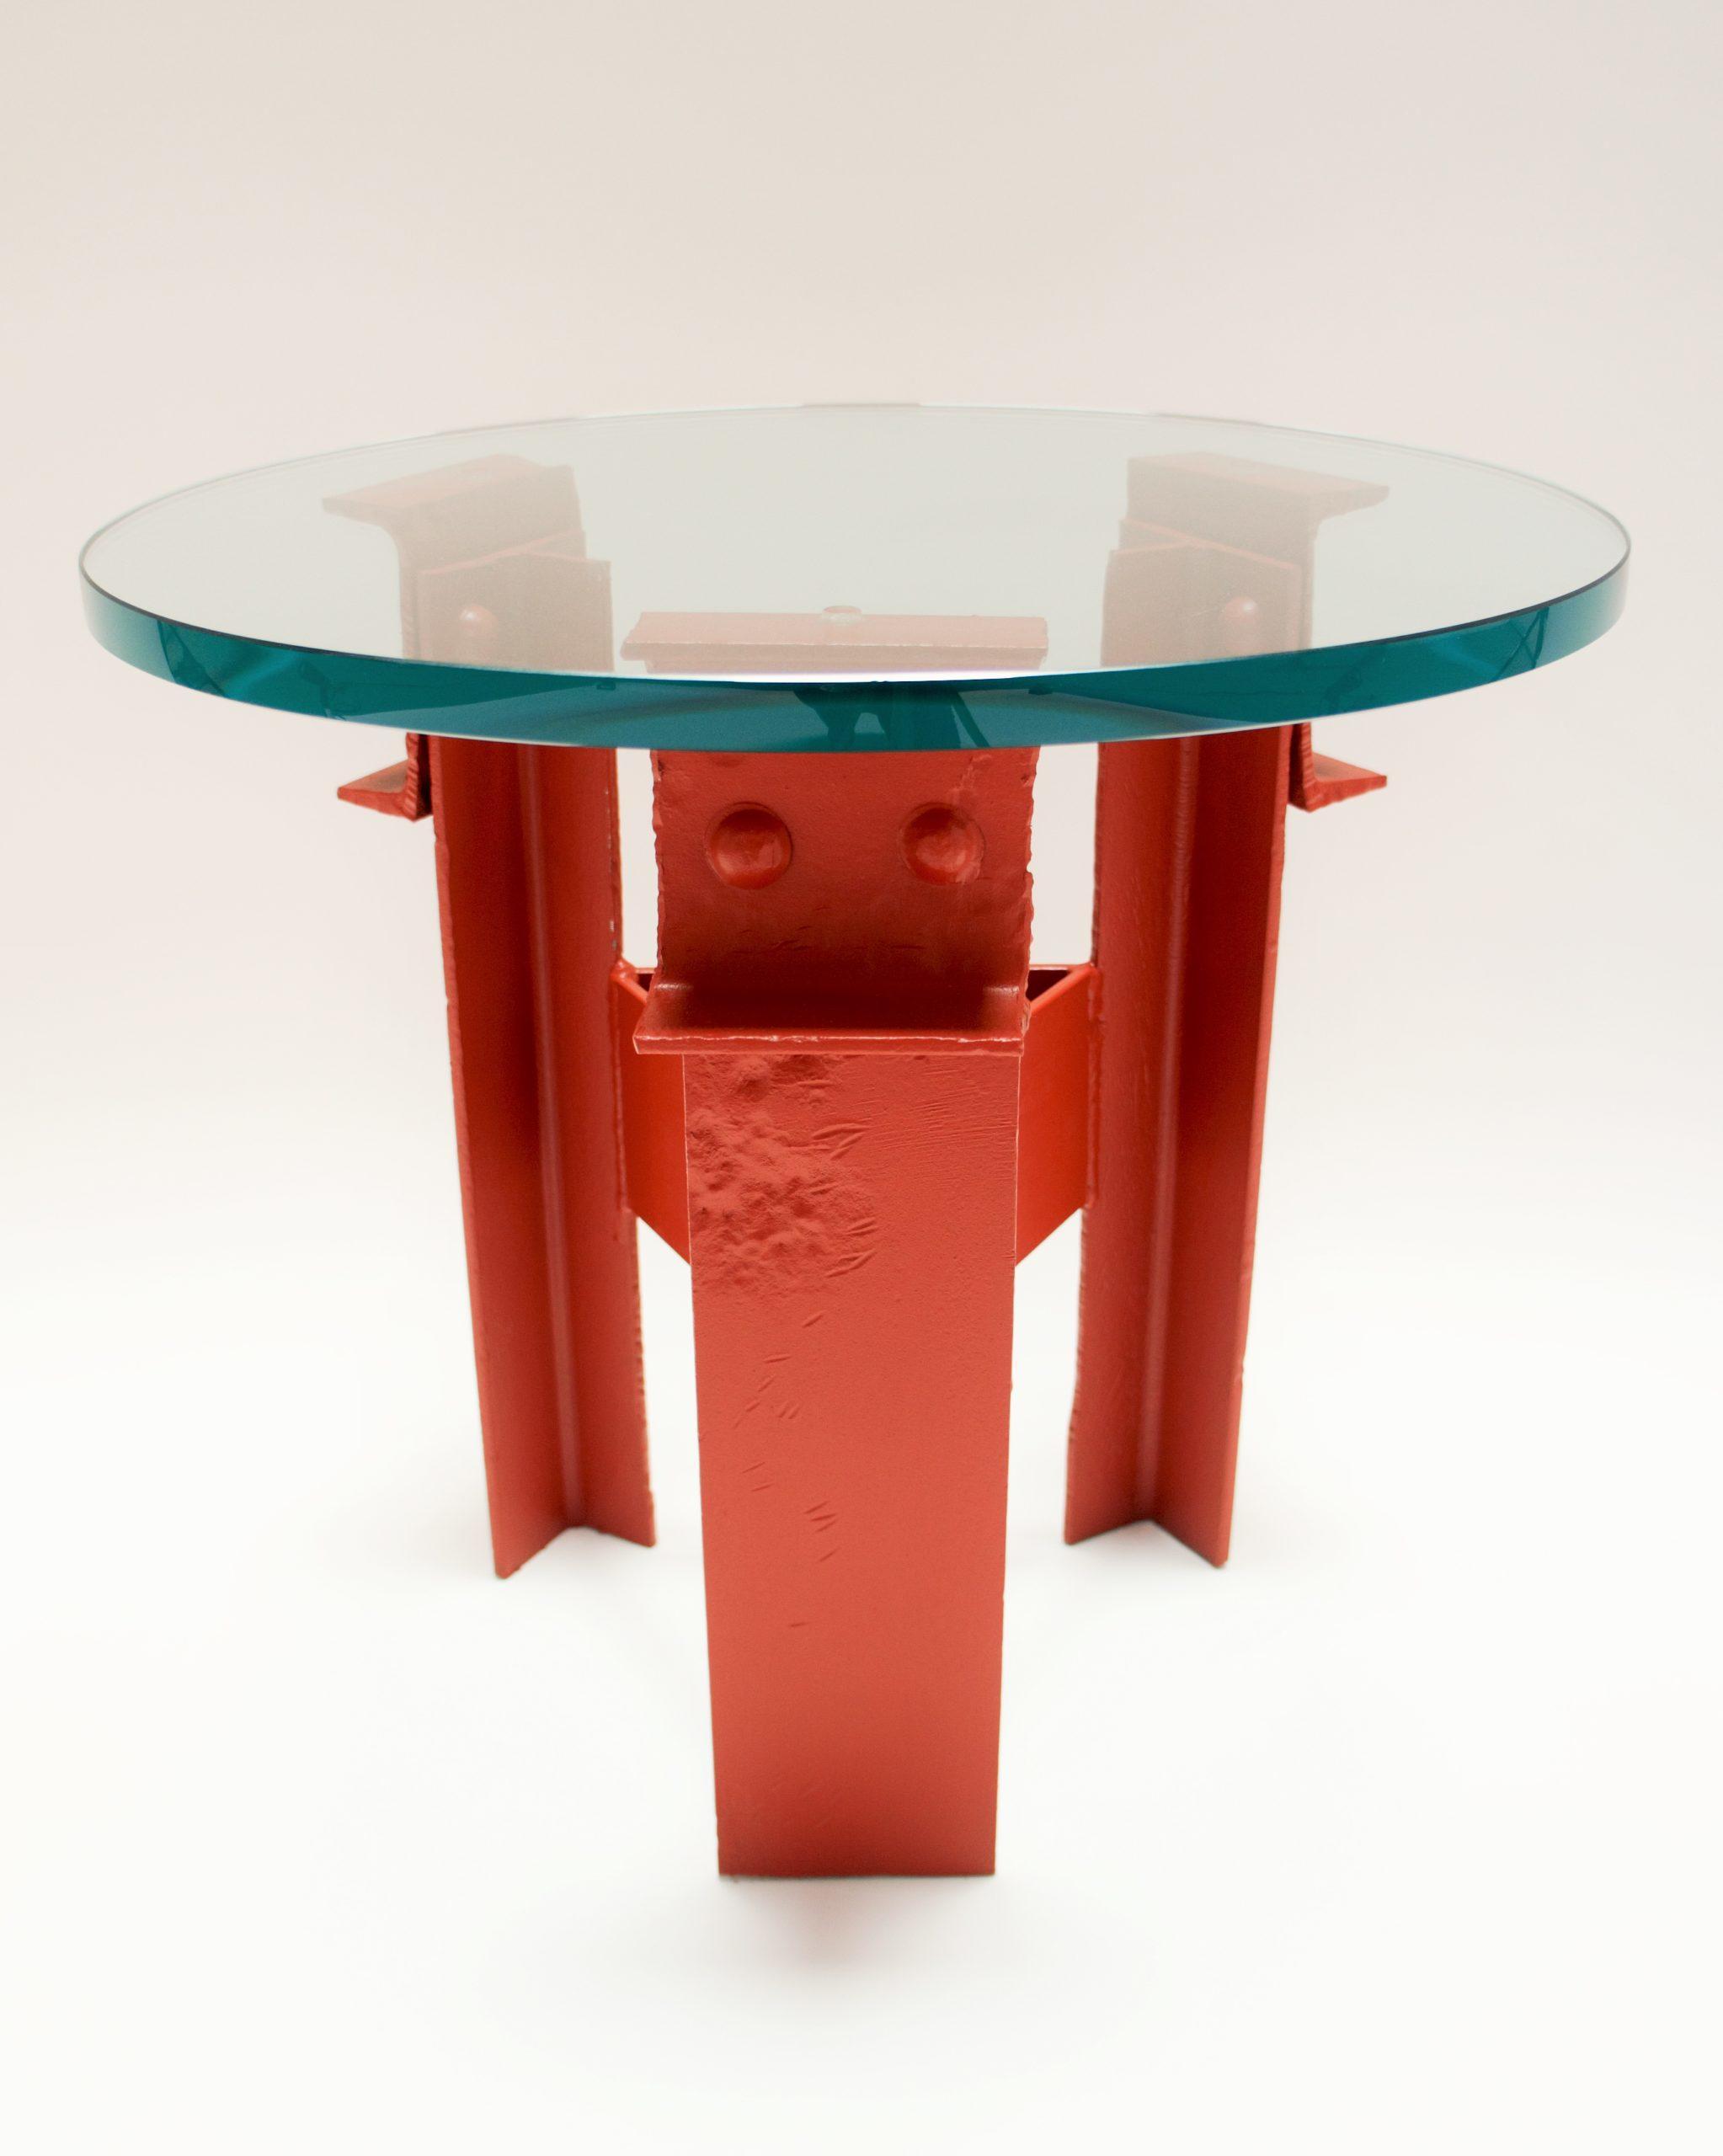 Golden Gate Bridge Steel - Tea Table